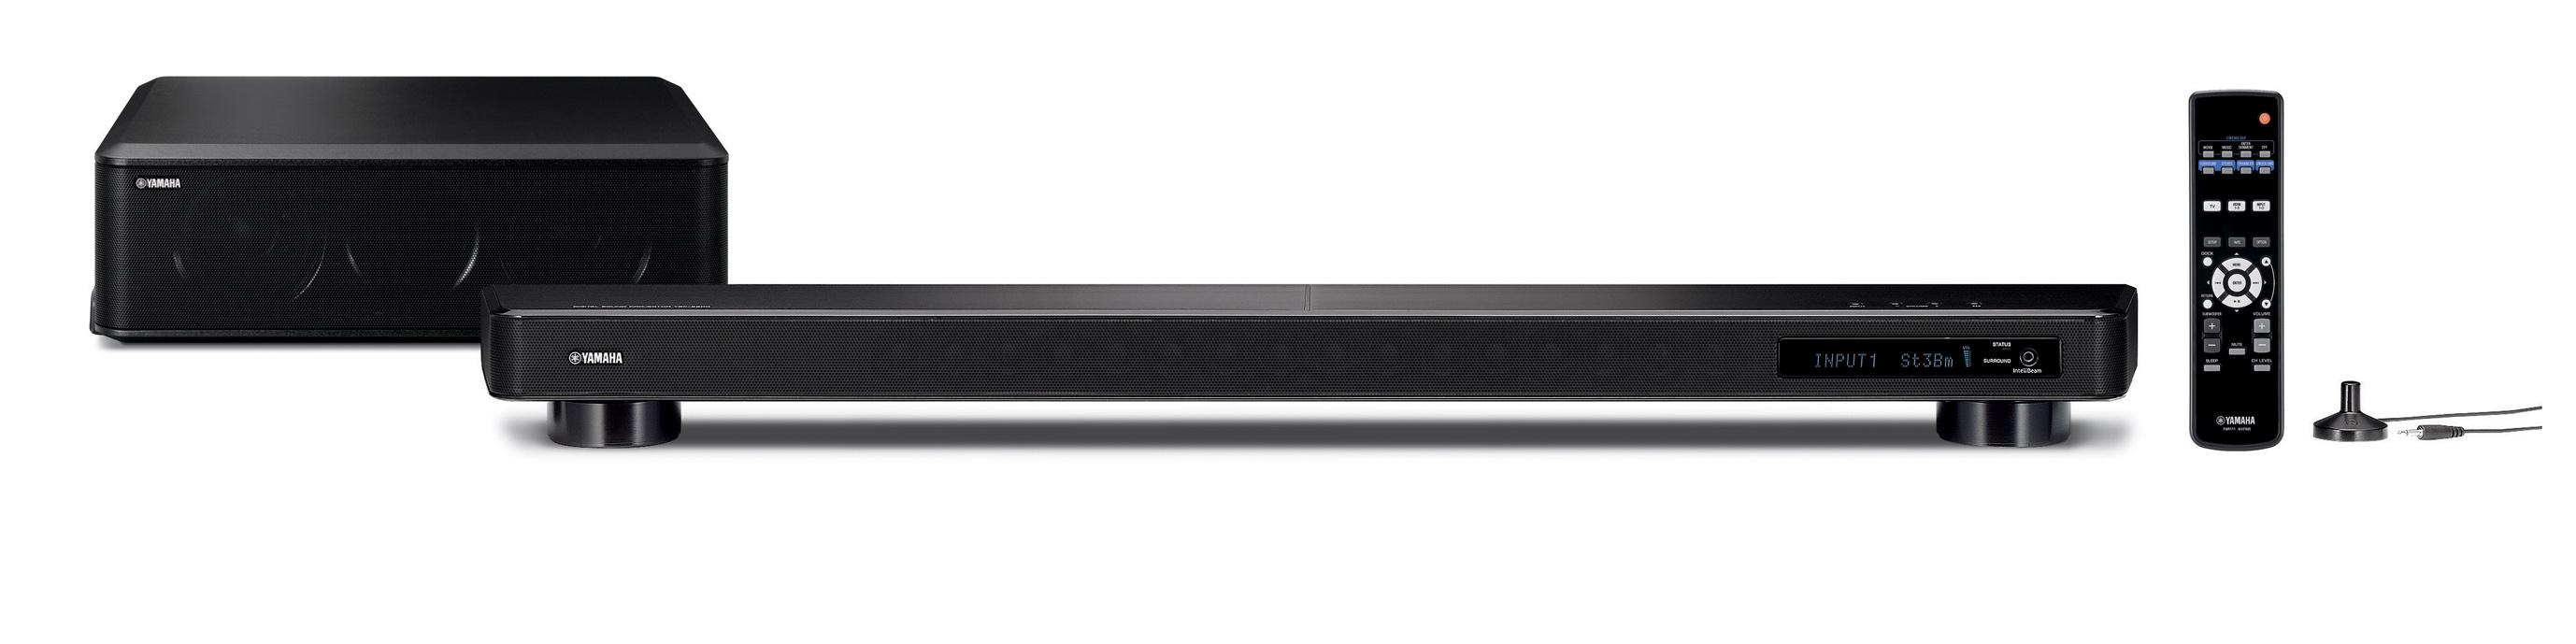 Review: Yamaha YSP-2200 - Musik aus dem Off